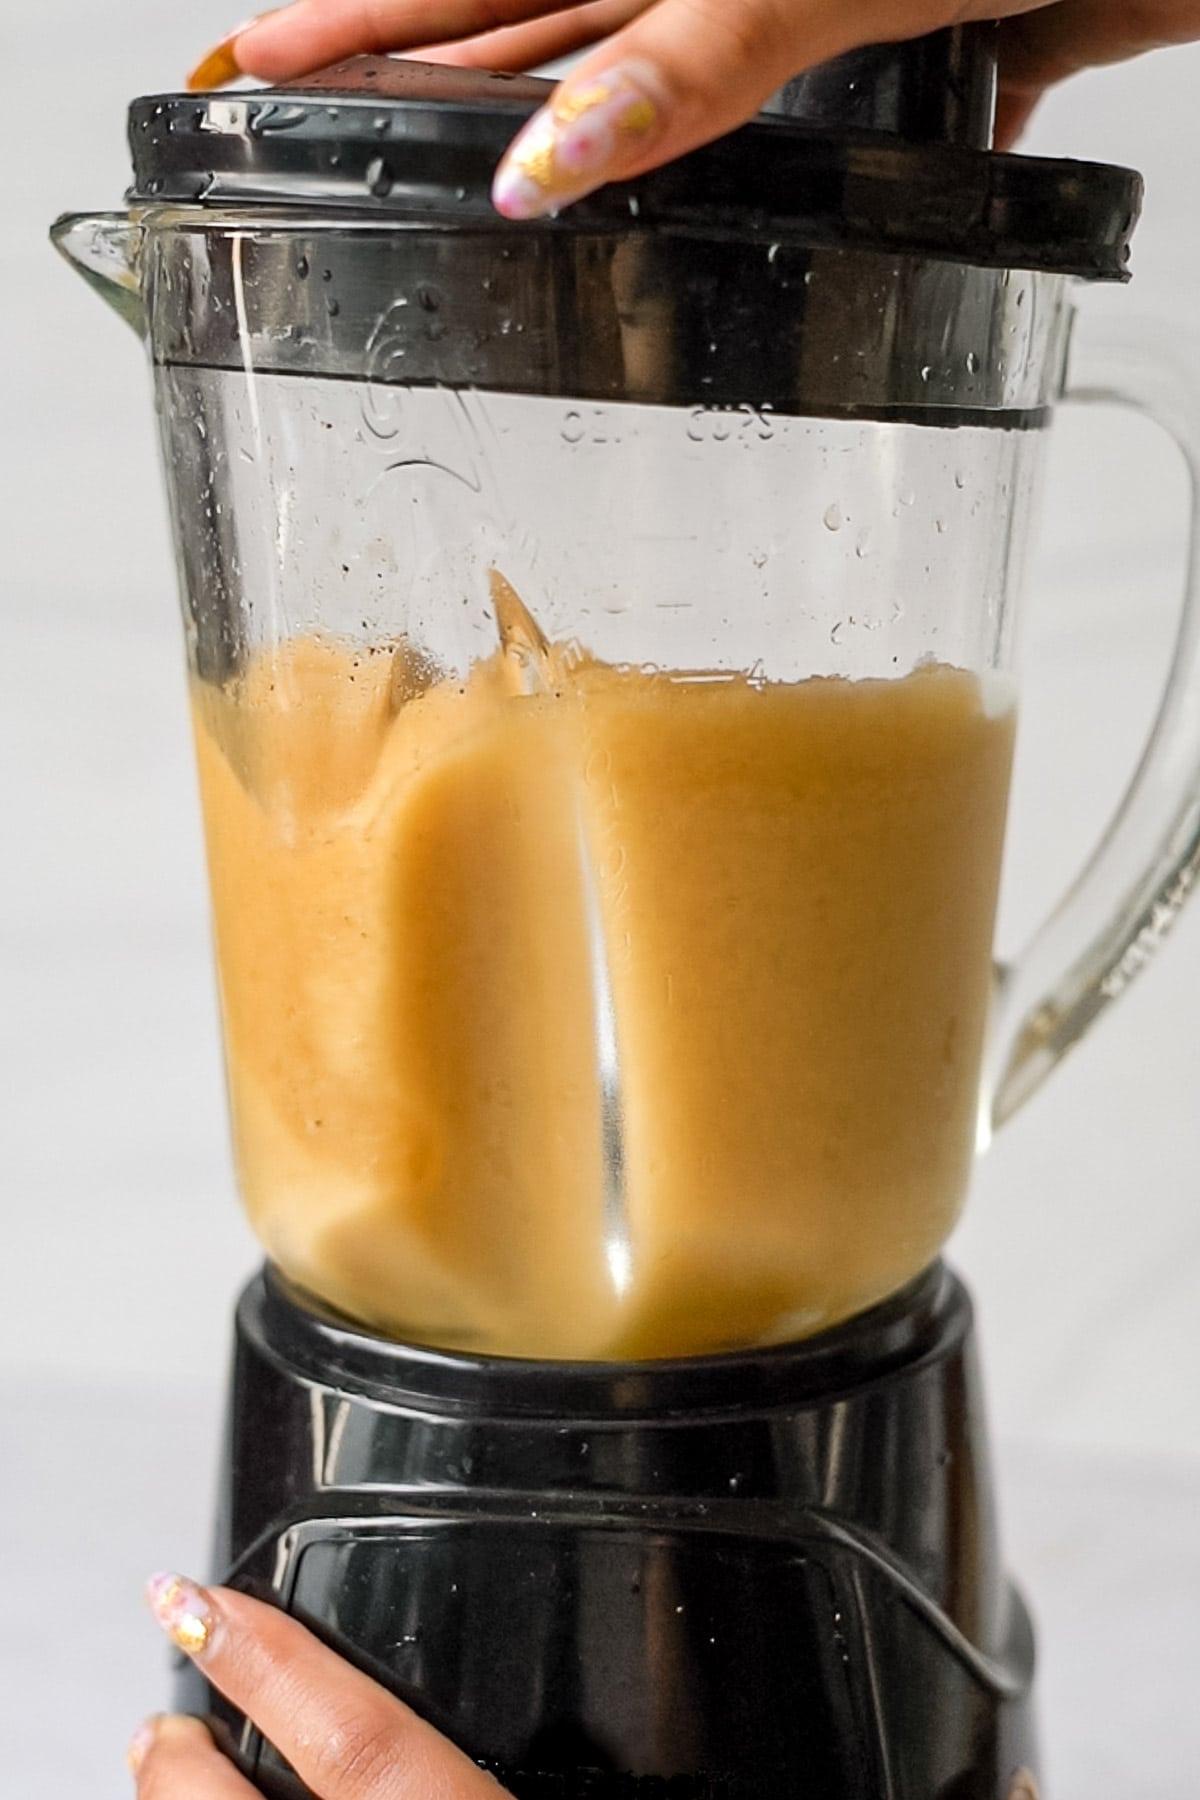 apple cider ice cubes blended into slushie